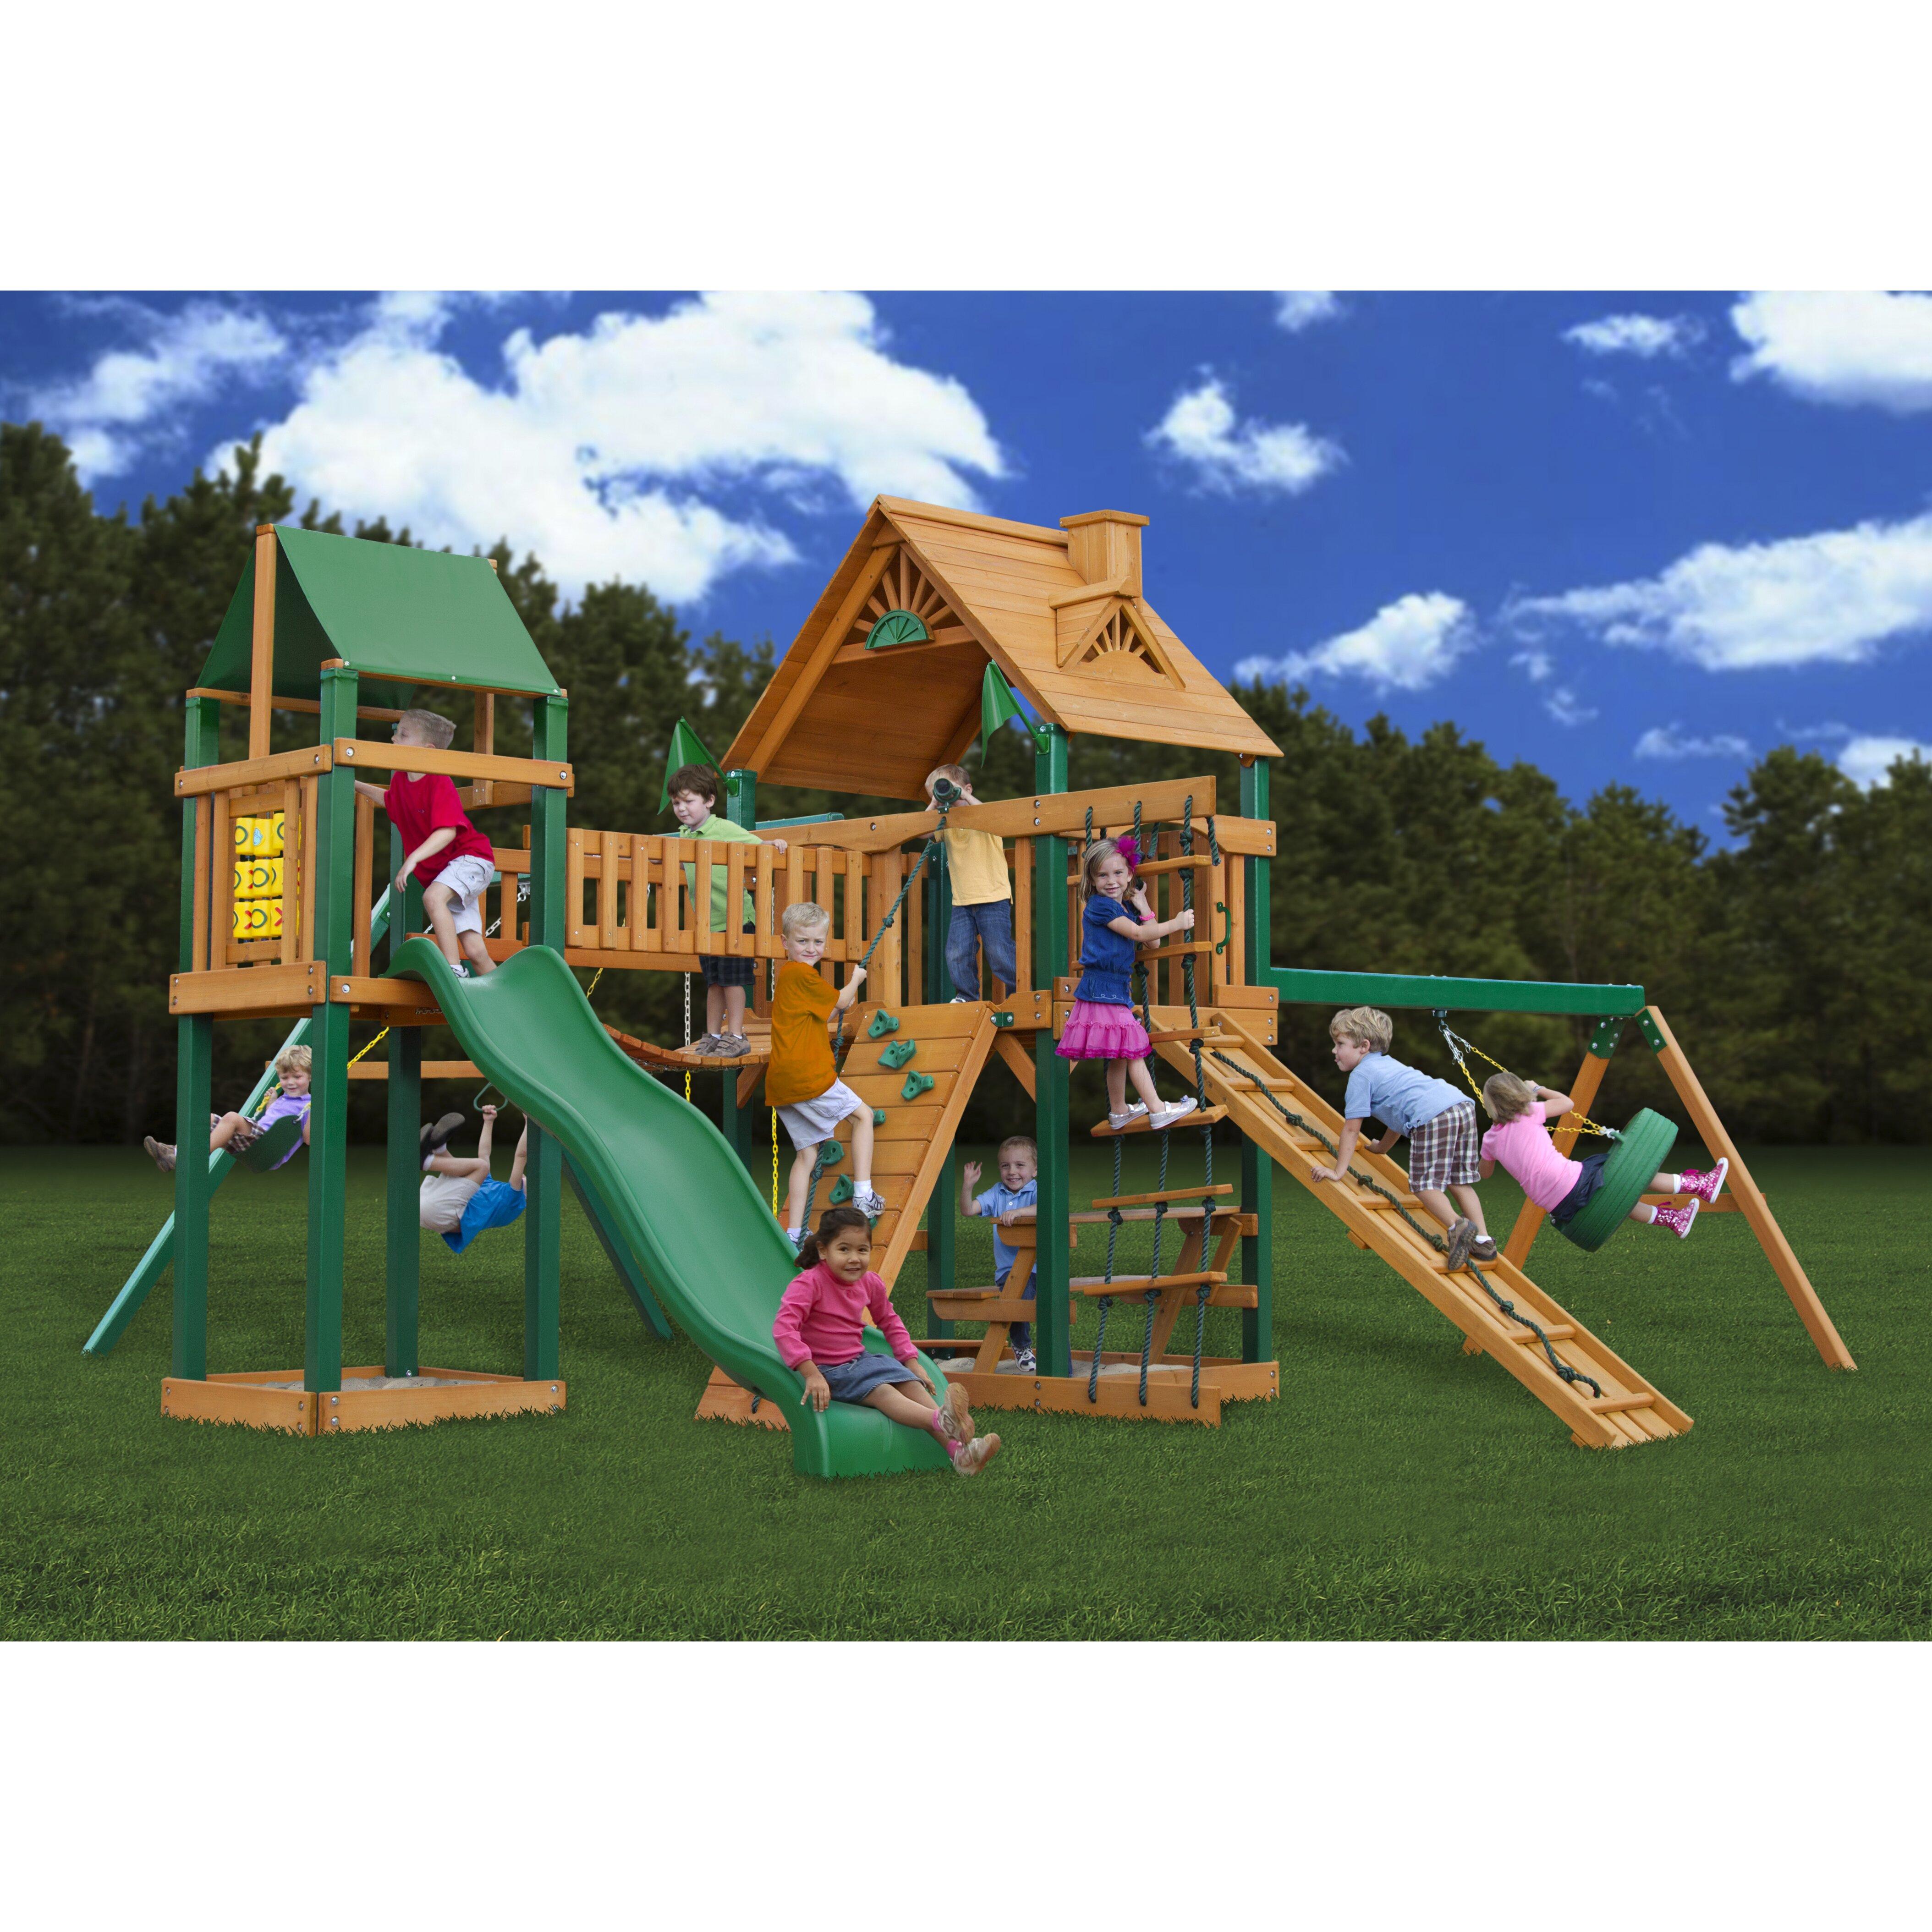 Gorilla Playsets Pioneer Peak With Amber Posts Cedar Swing